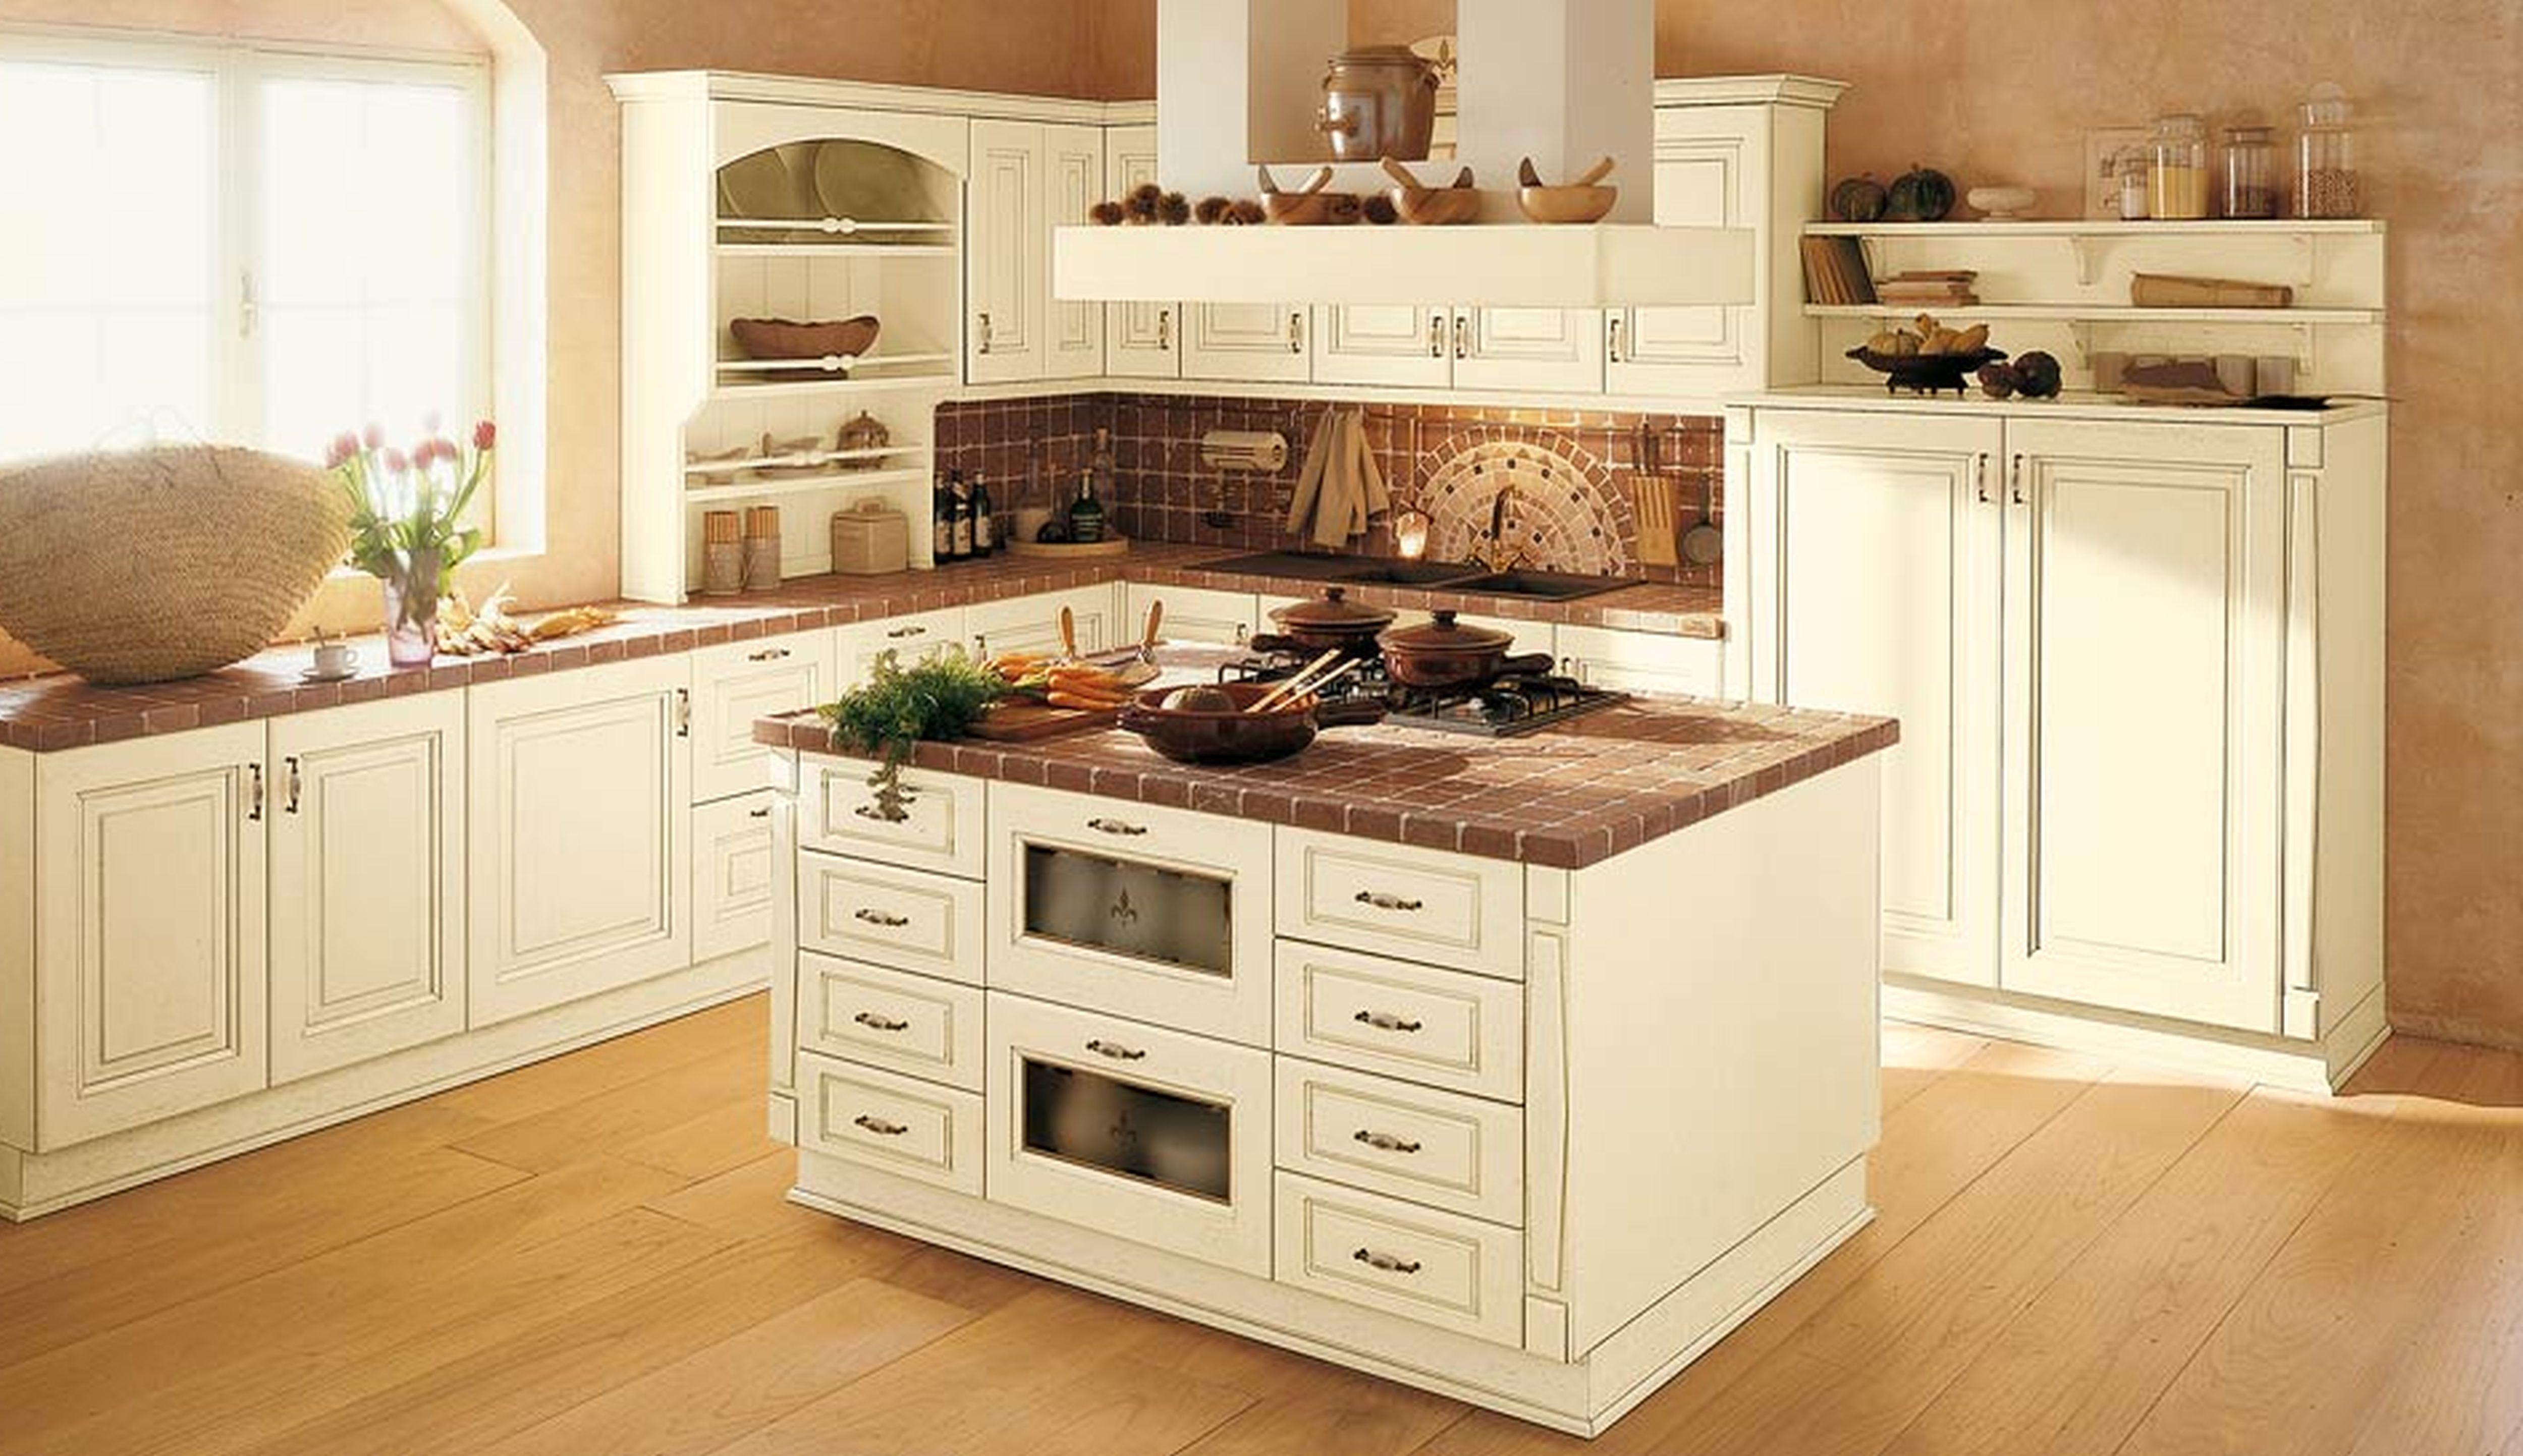 hardwood flooring business of the wood maker page 6 wood wallpaper regarding kitchen remodeling ideas inspirationa kitchen designing 0d inspirations of wood floor designs